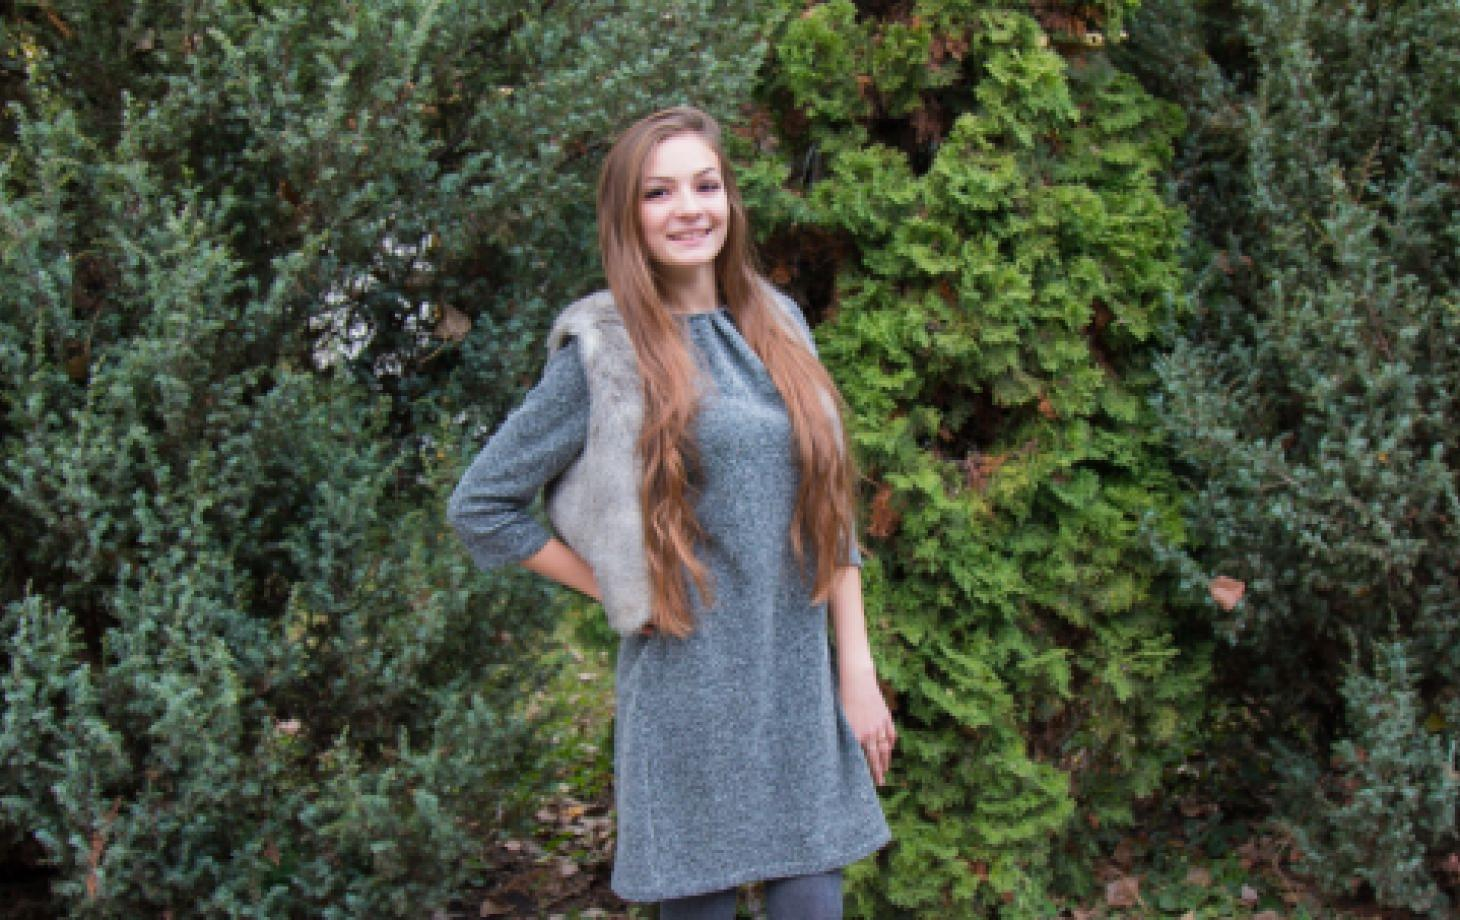 Ирина Урсатий, 18 лет